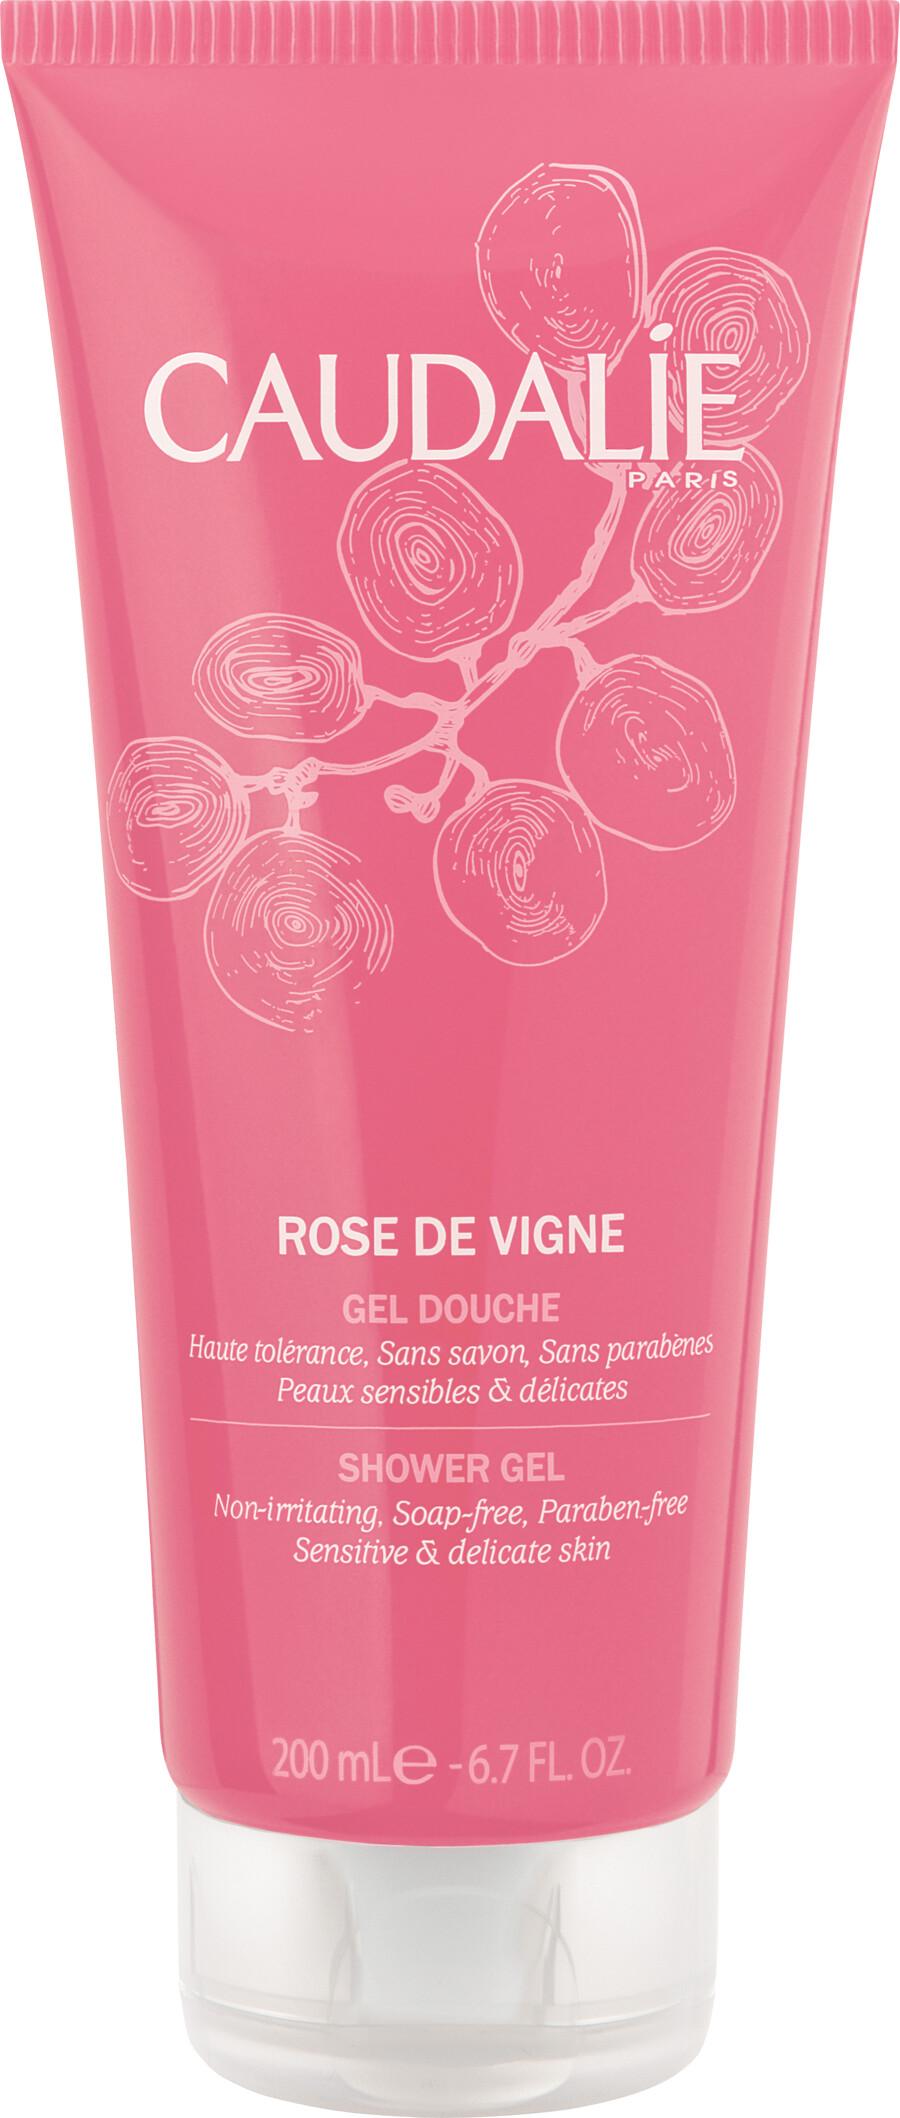 Caudalie Rose De Vigne Showergel 200 Ml